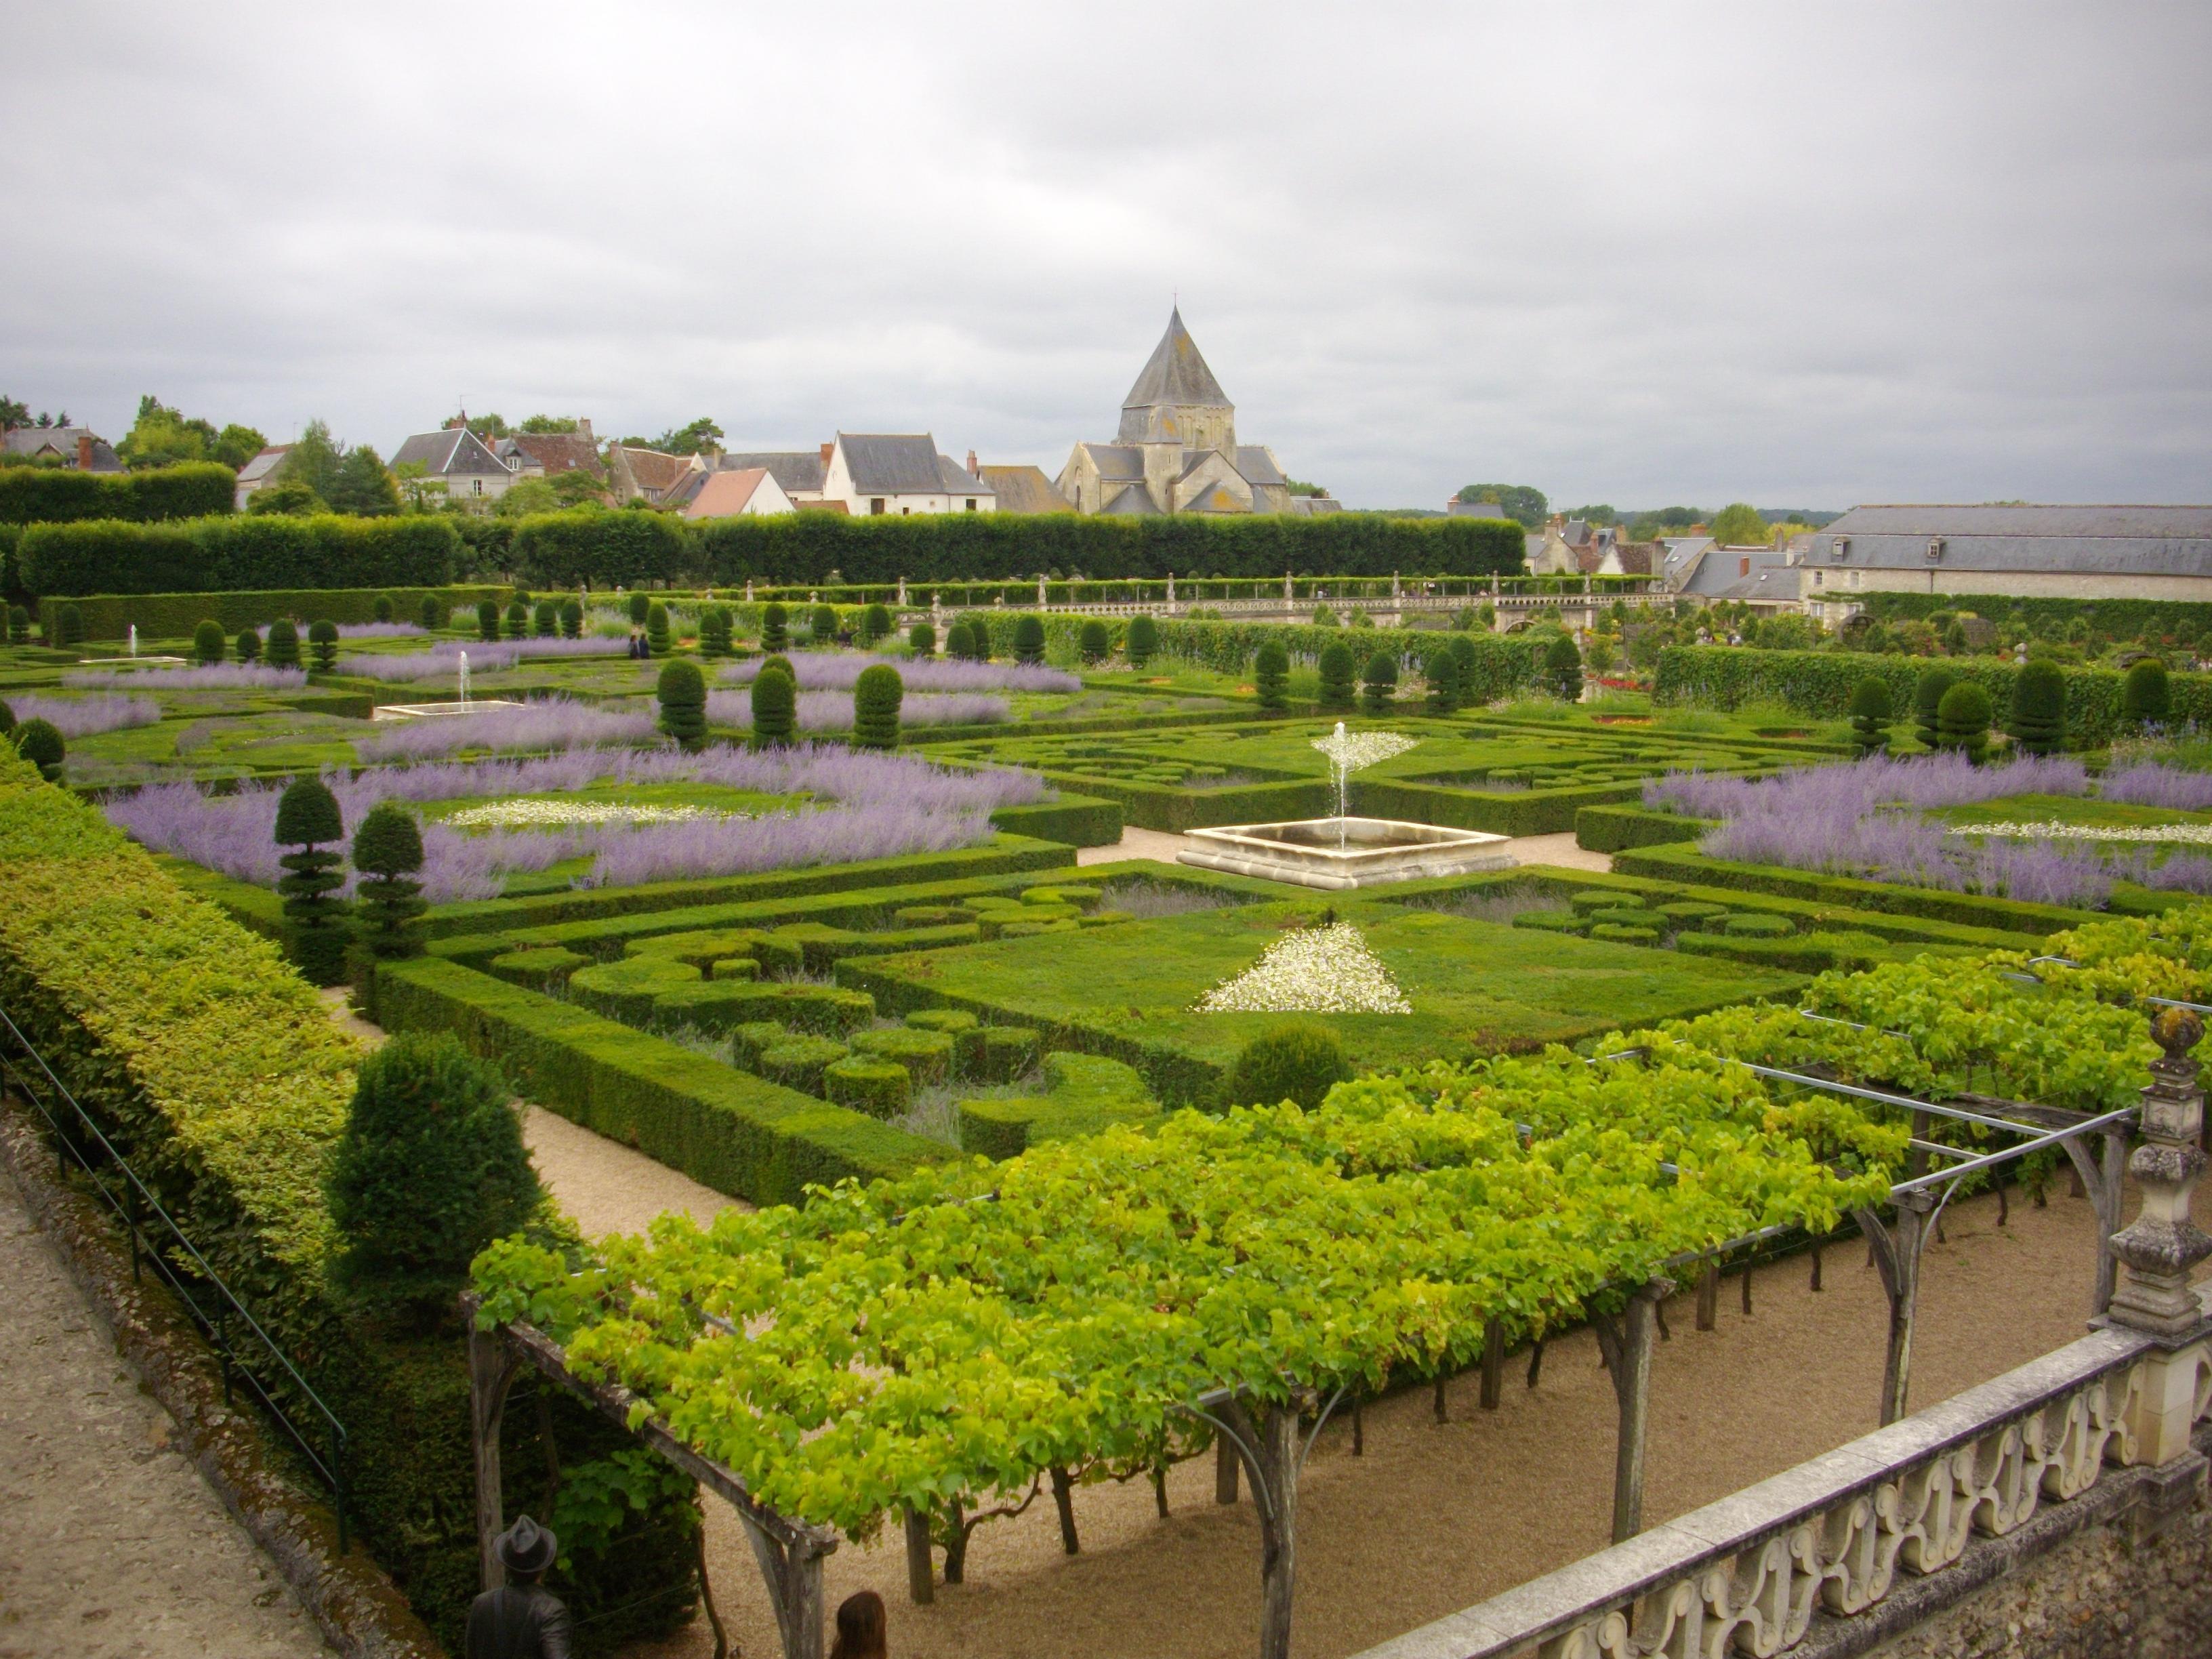 File:Villandry - château, jardin d\'ornement (16).jpg - Wikimedia Commons